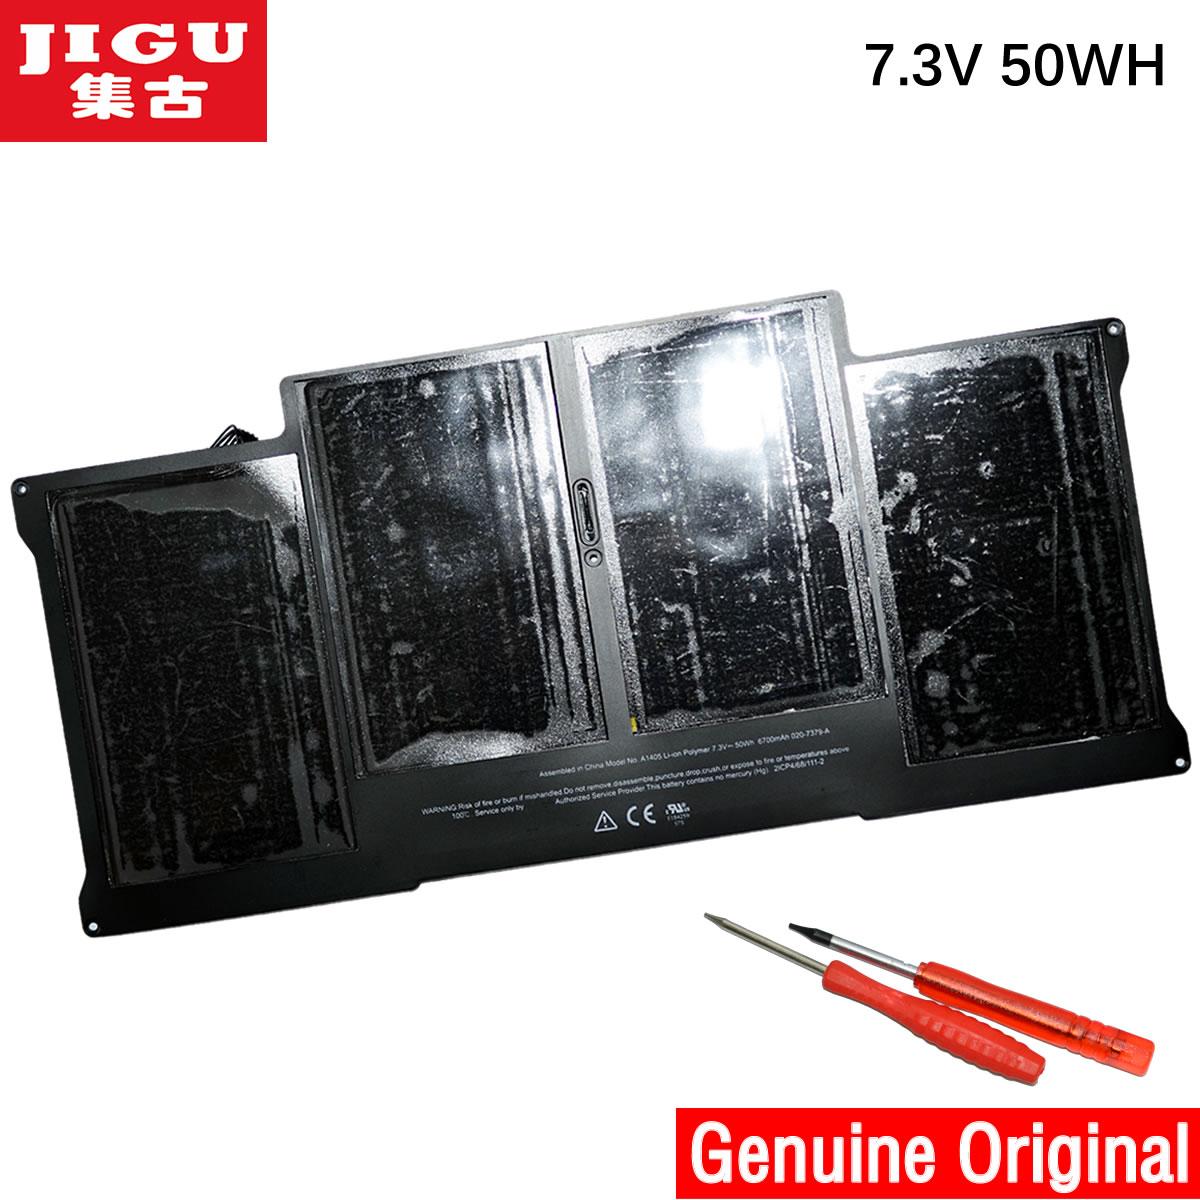 JIGU Special Price New Original battery A1405 for Apple Macbook Air 13 A1369 2011, A1466 2012  Genuine Battery<br>